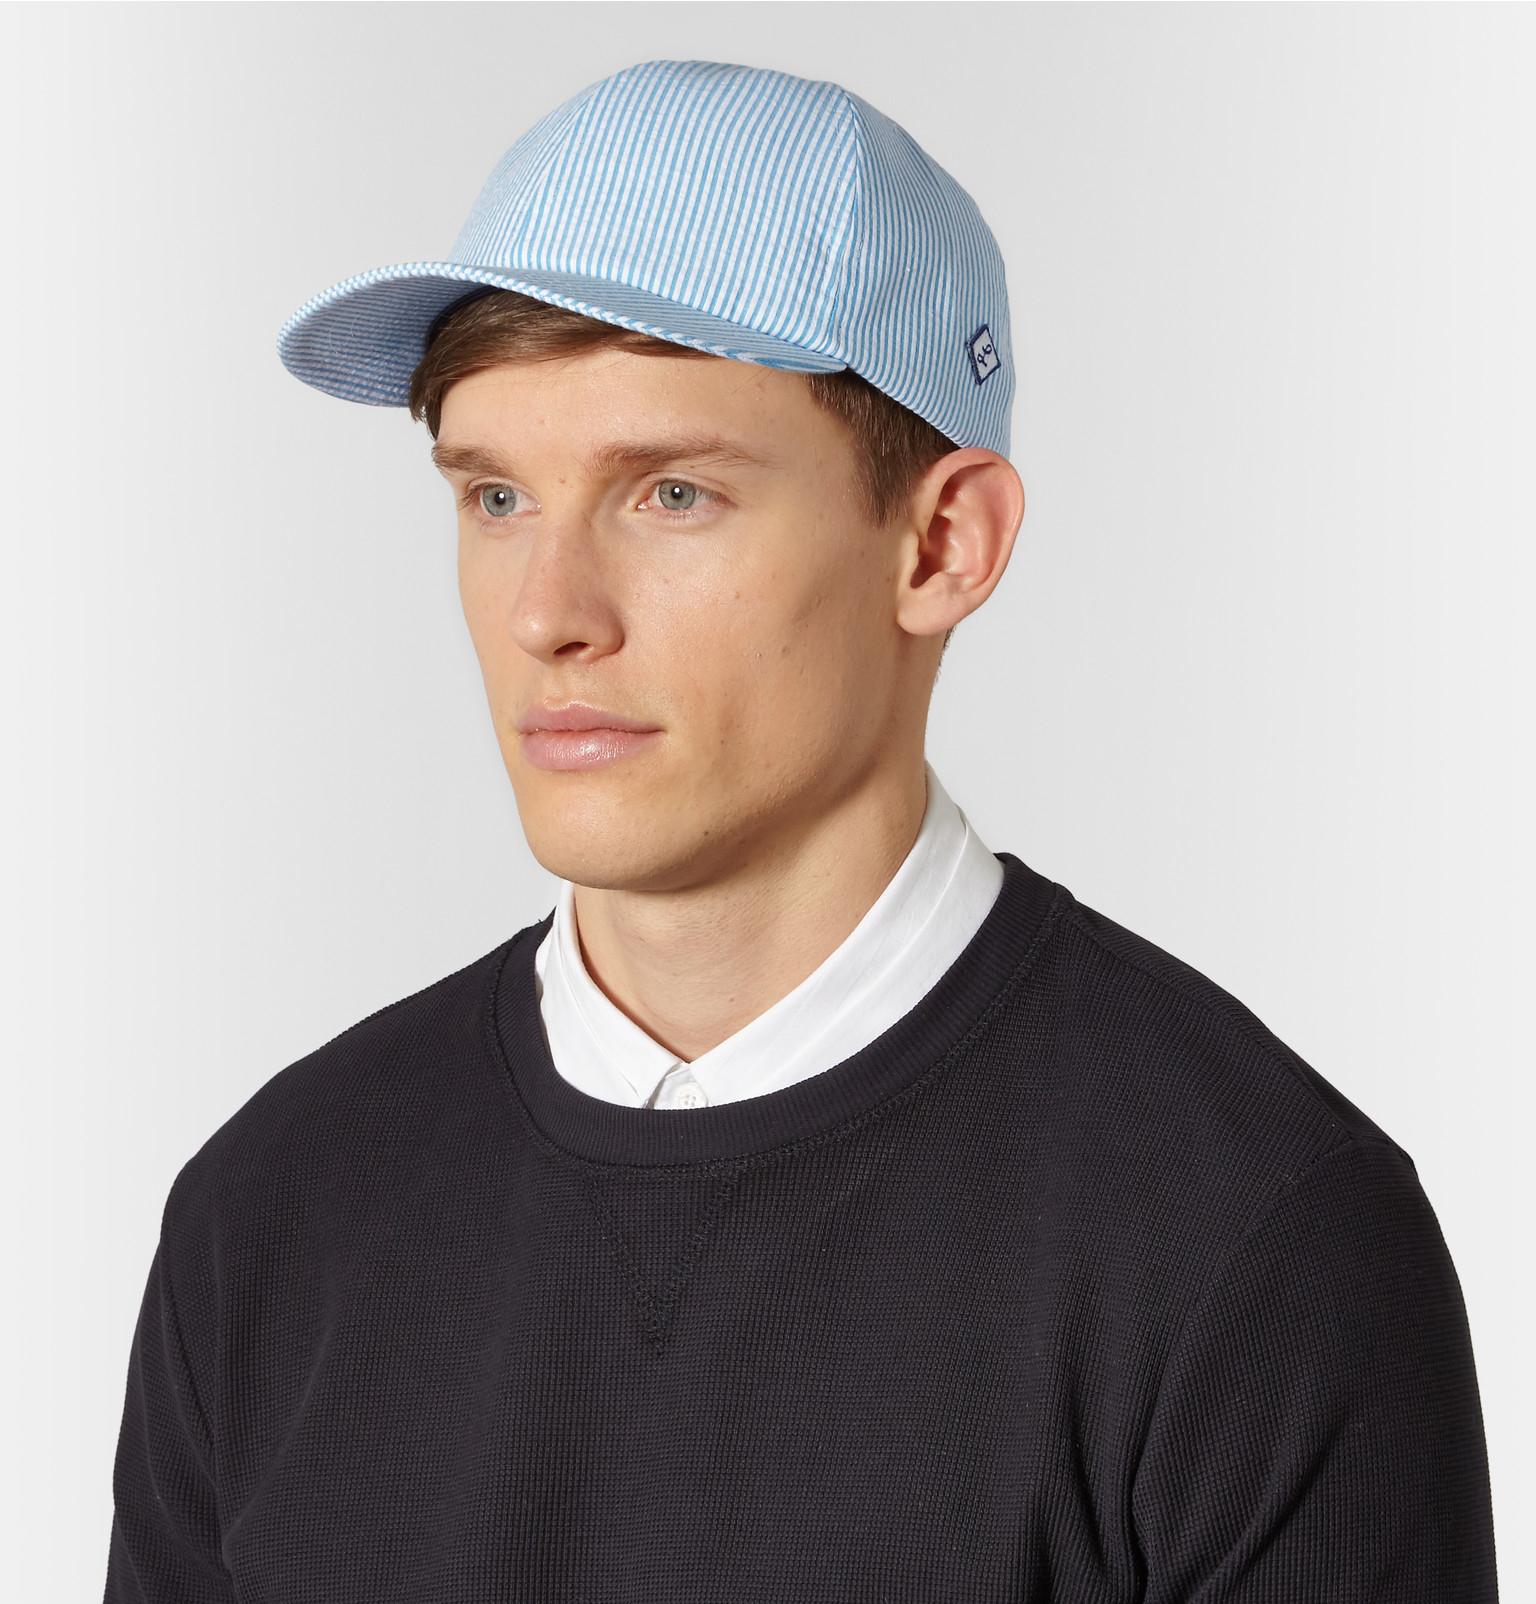 Larose Seersucker Cotton Baseball Cap In Blue For Men Lyst